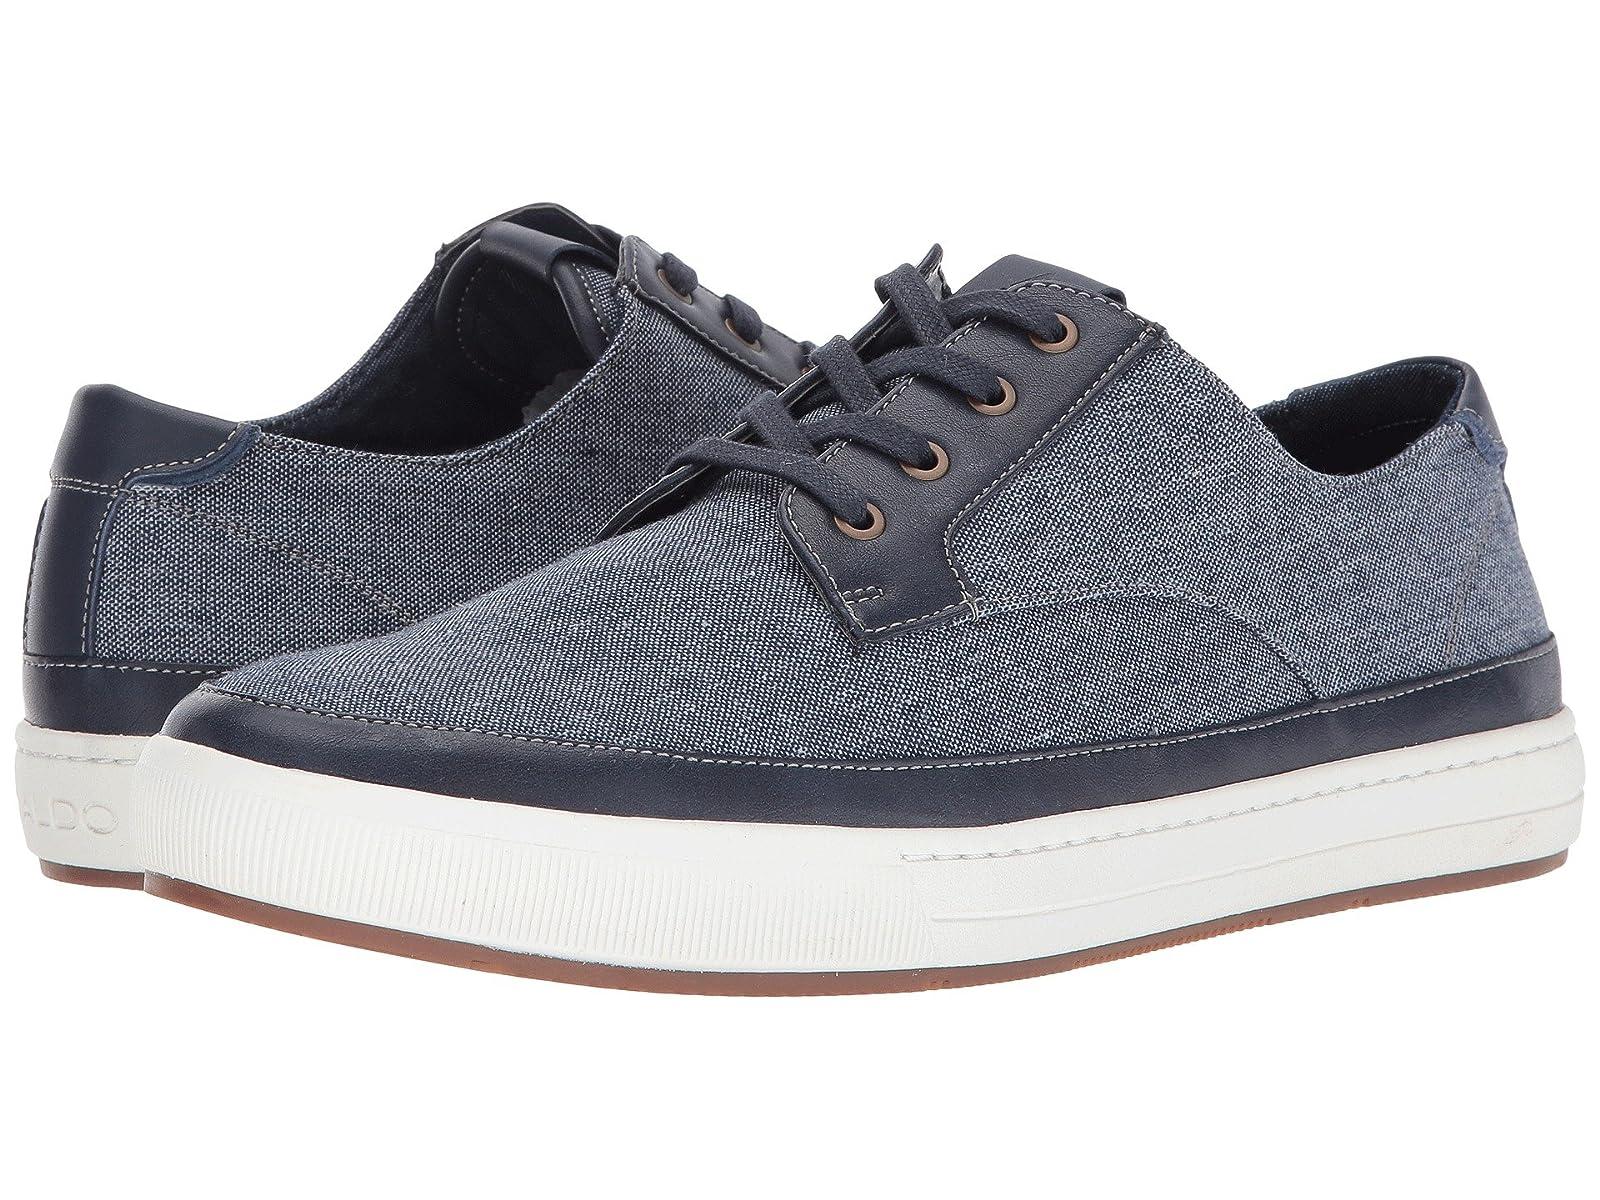 ALDO PorrettaCheap and distinctive eye-catching shoes